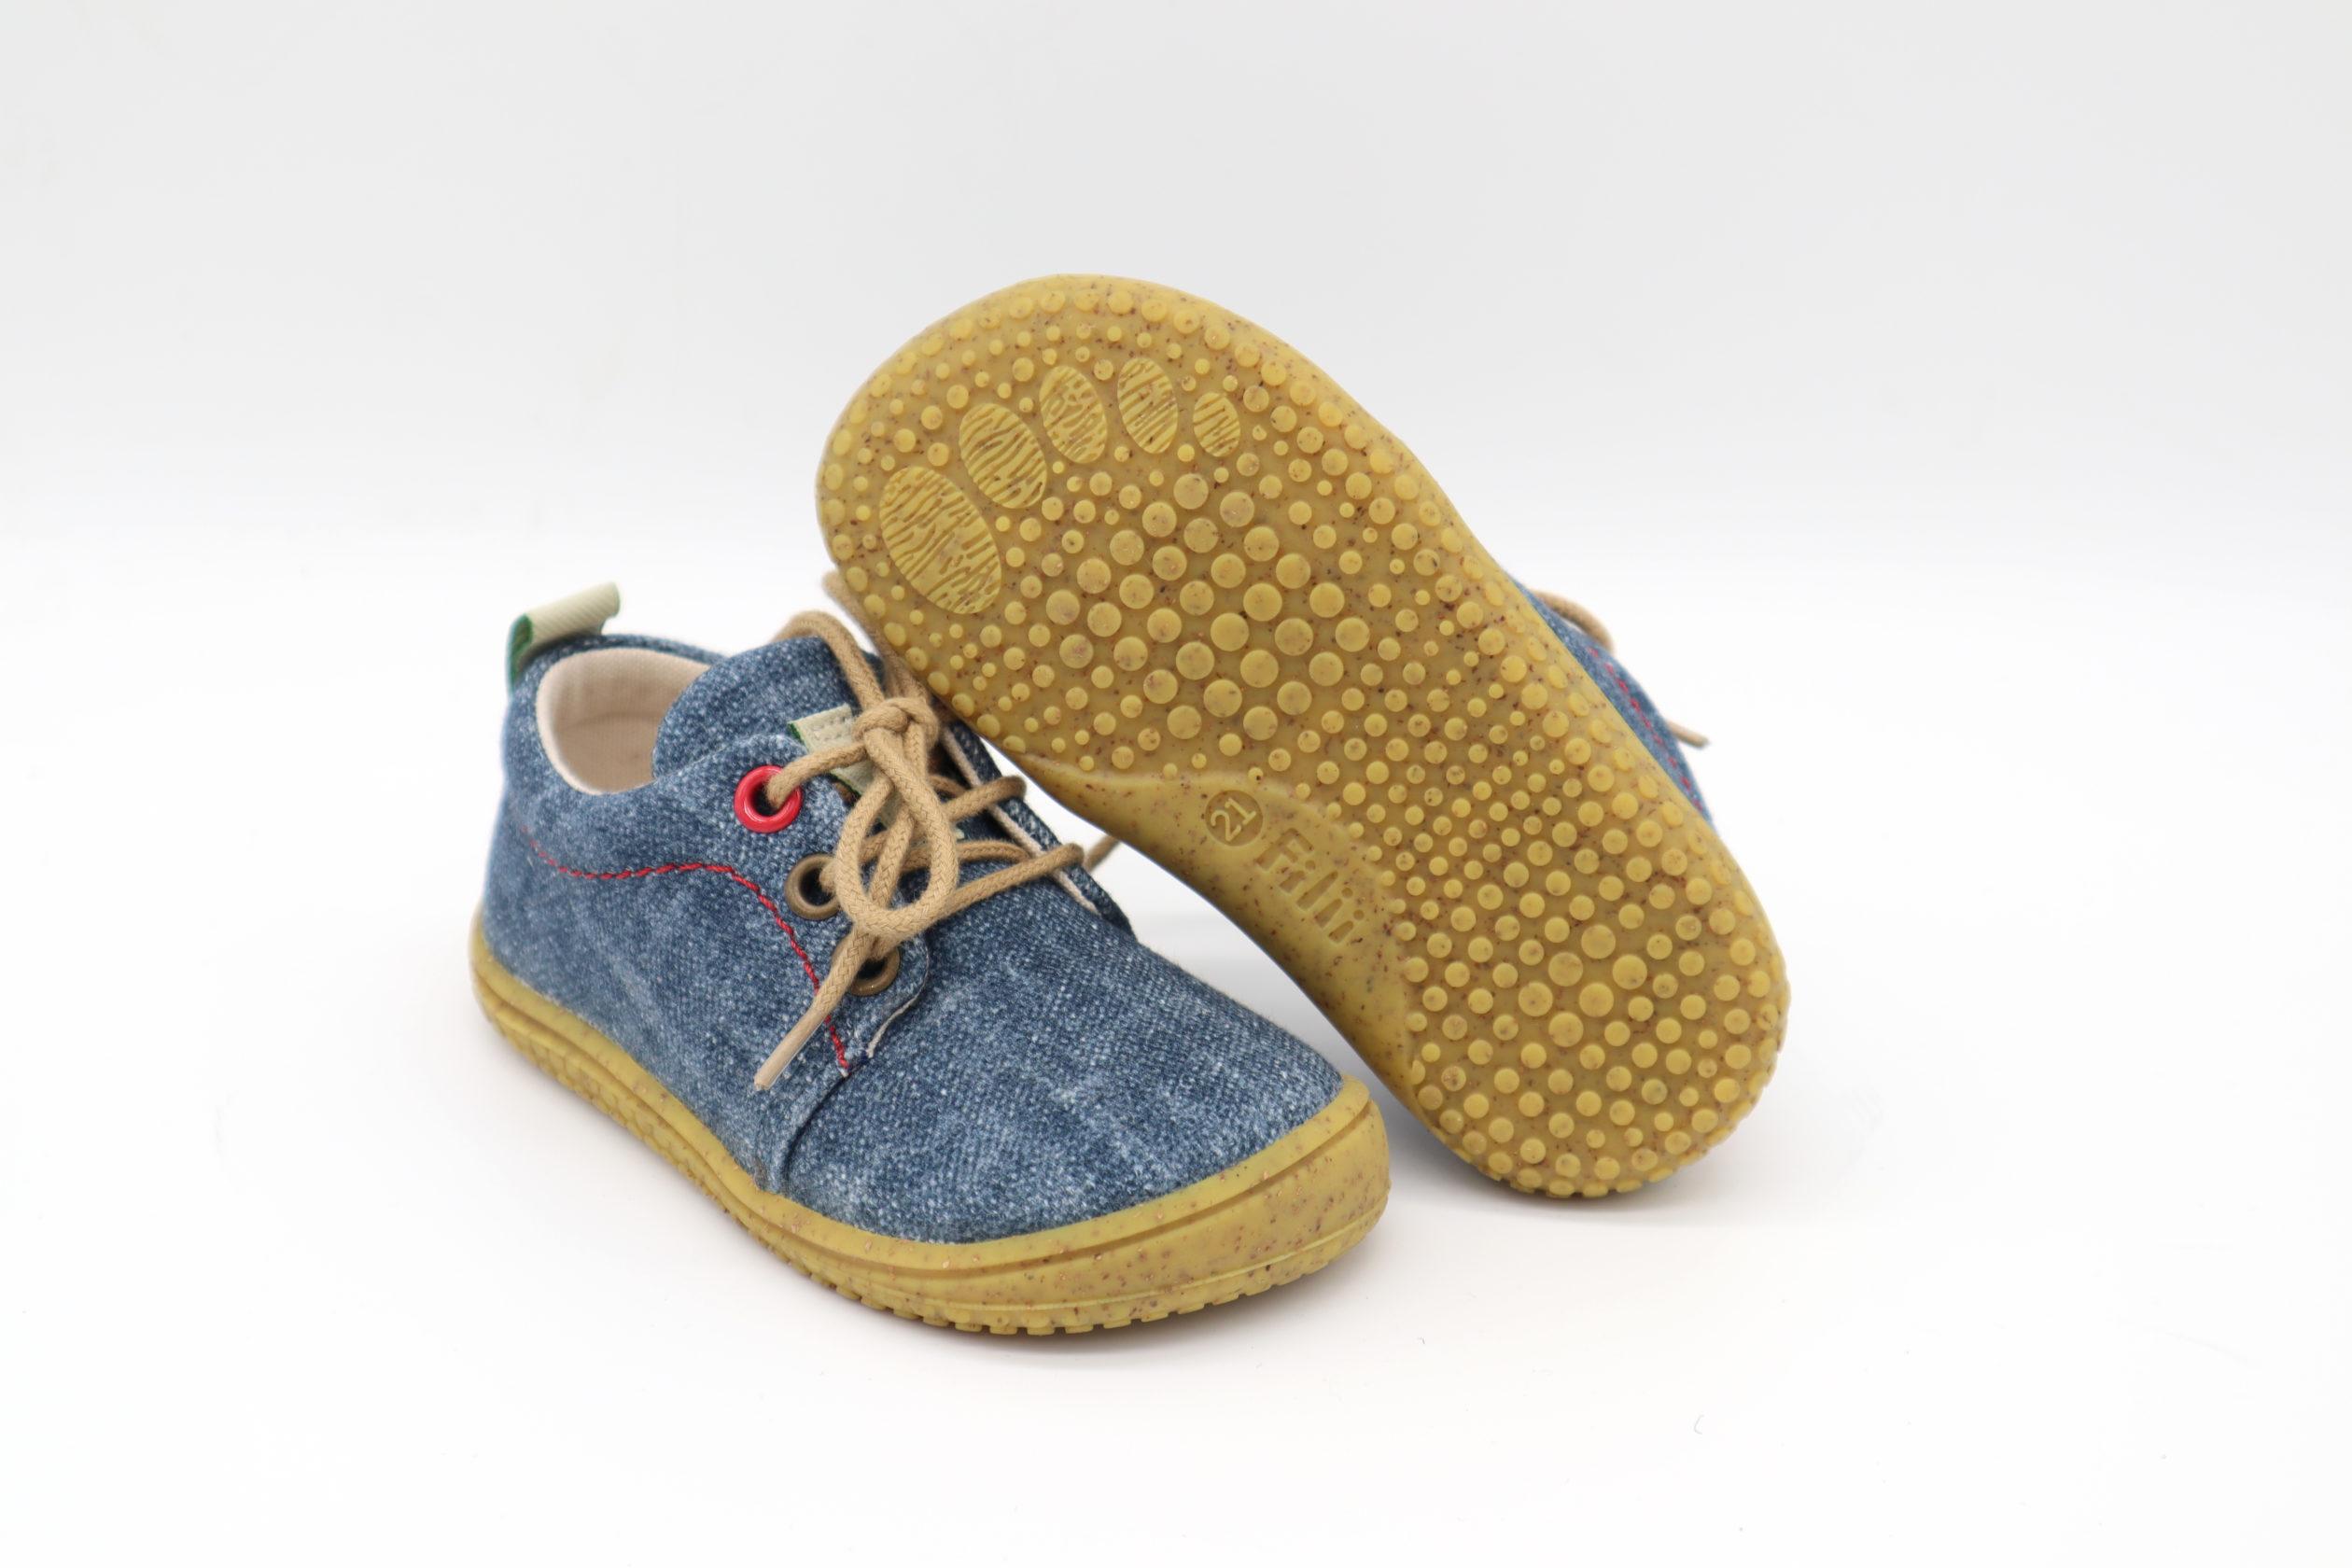 Sneaker, Bio-Baumwolle, vegan, Schnürer, jeans